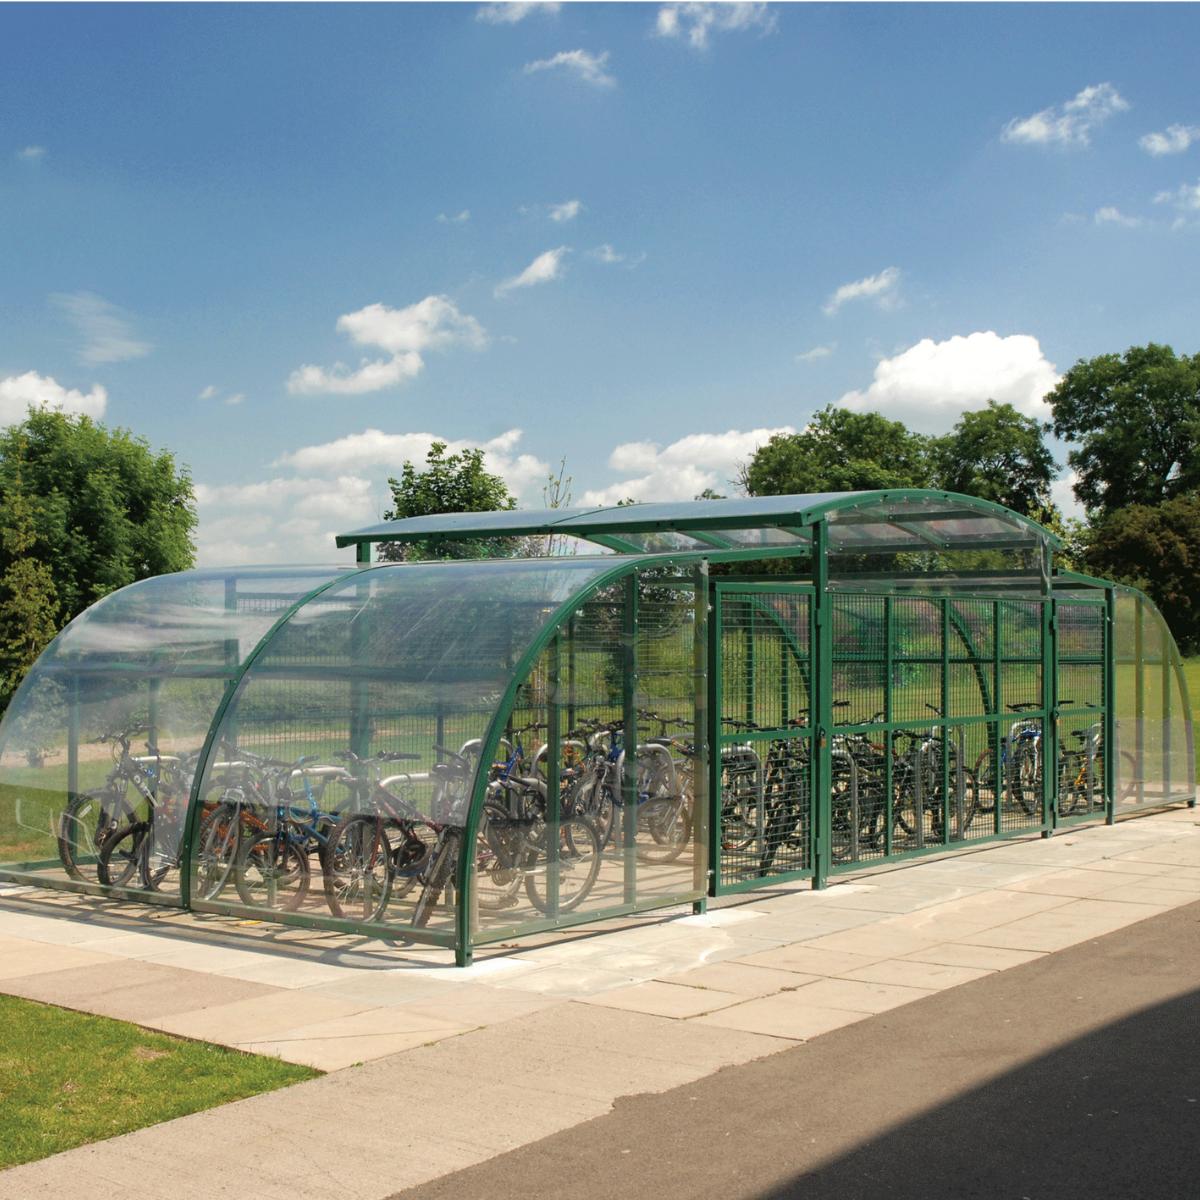 Wardale / Littleborough / Newcastle Cycle Compound